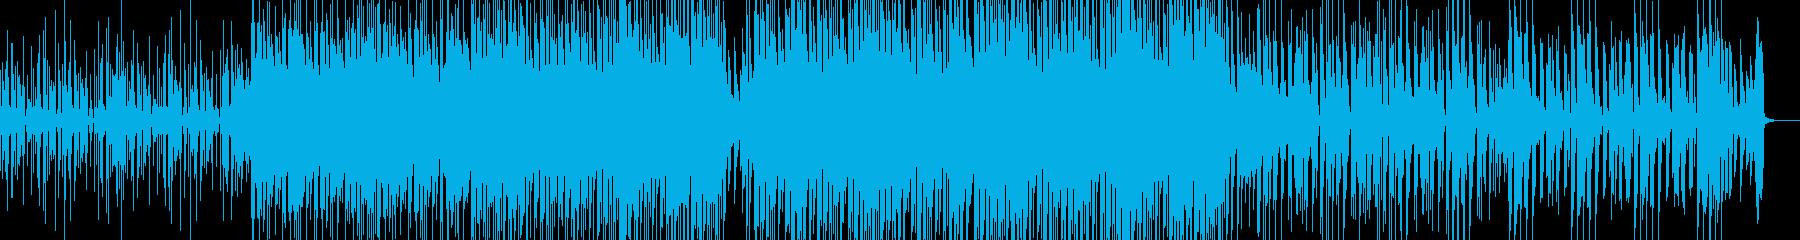 Calm deep house's reproduced waveform